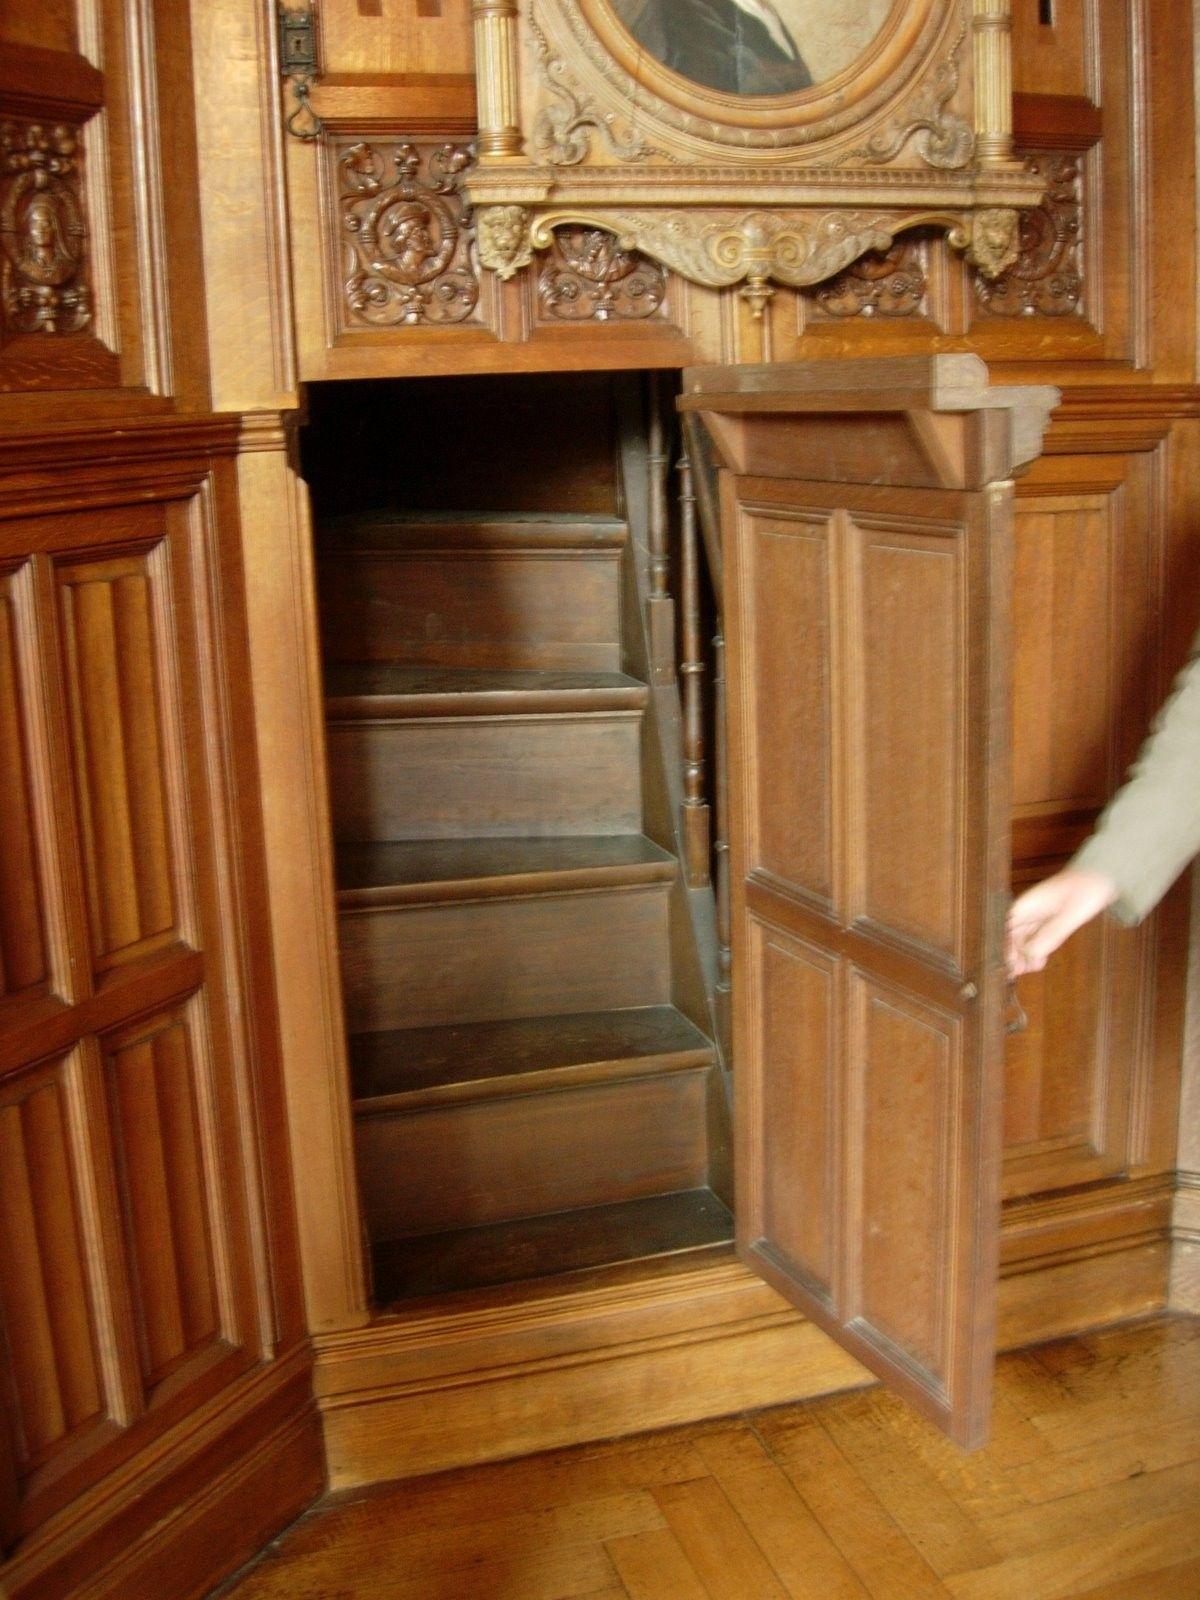 Secret Room Ideas We Know How To Do It Hidden Rooms Secret Rooms Victorian Homes